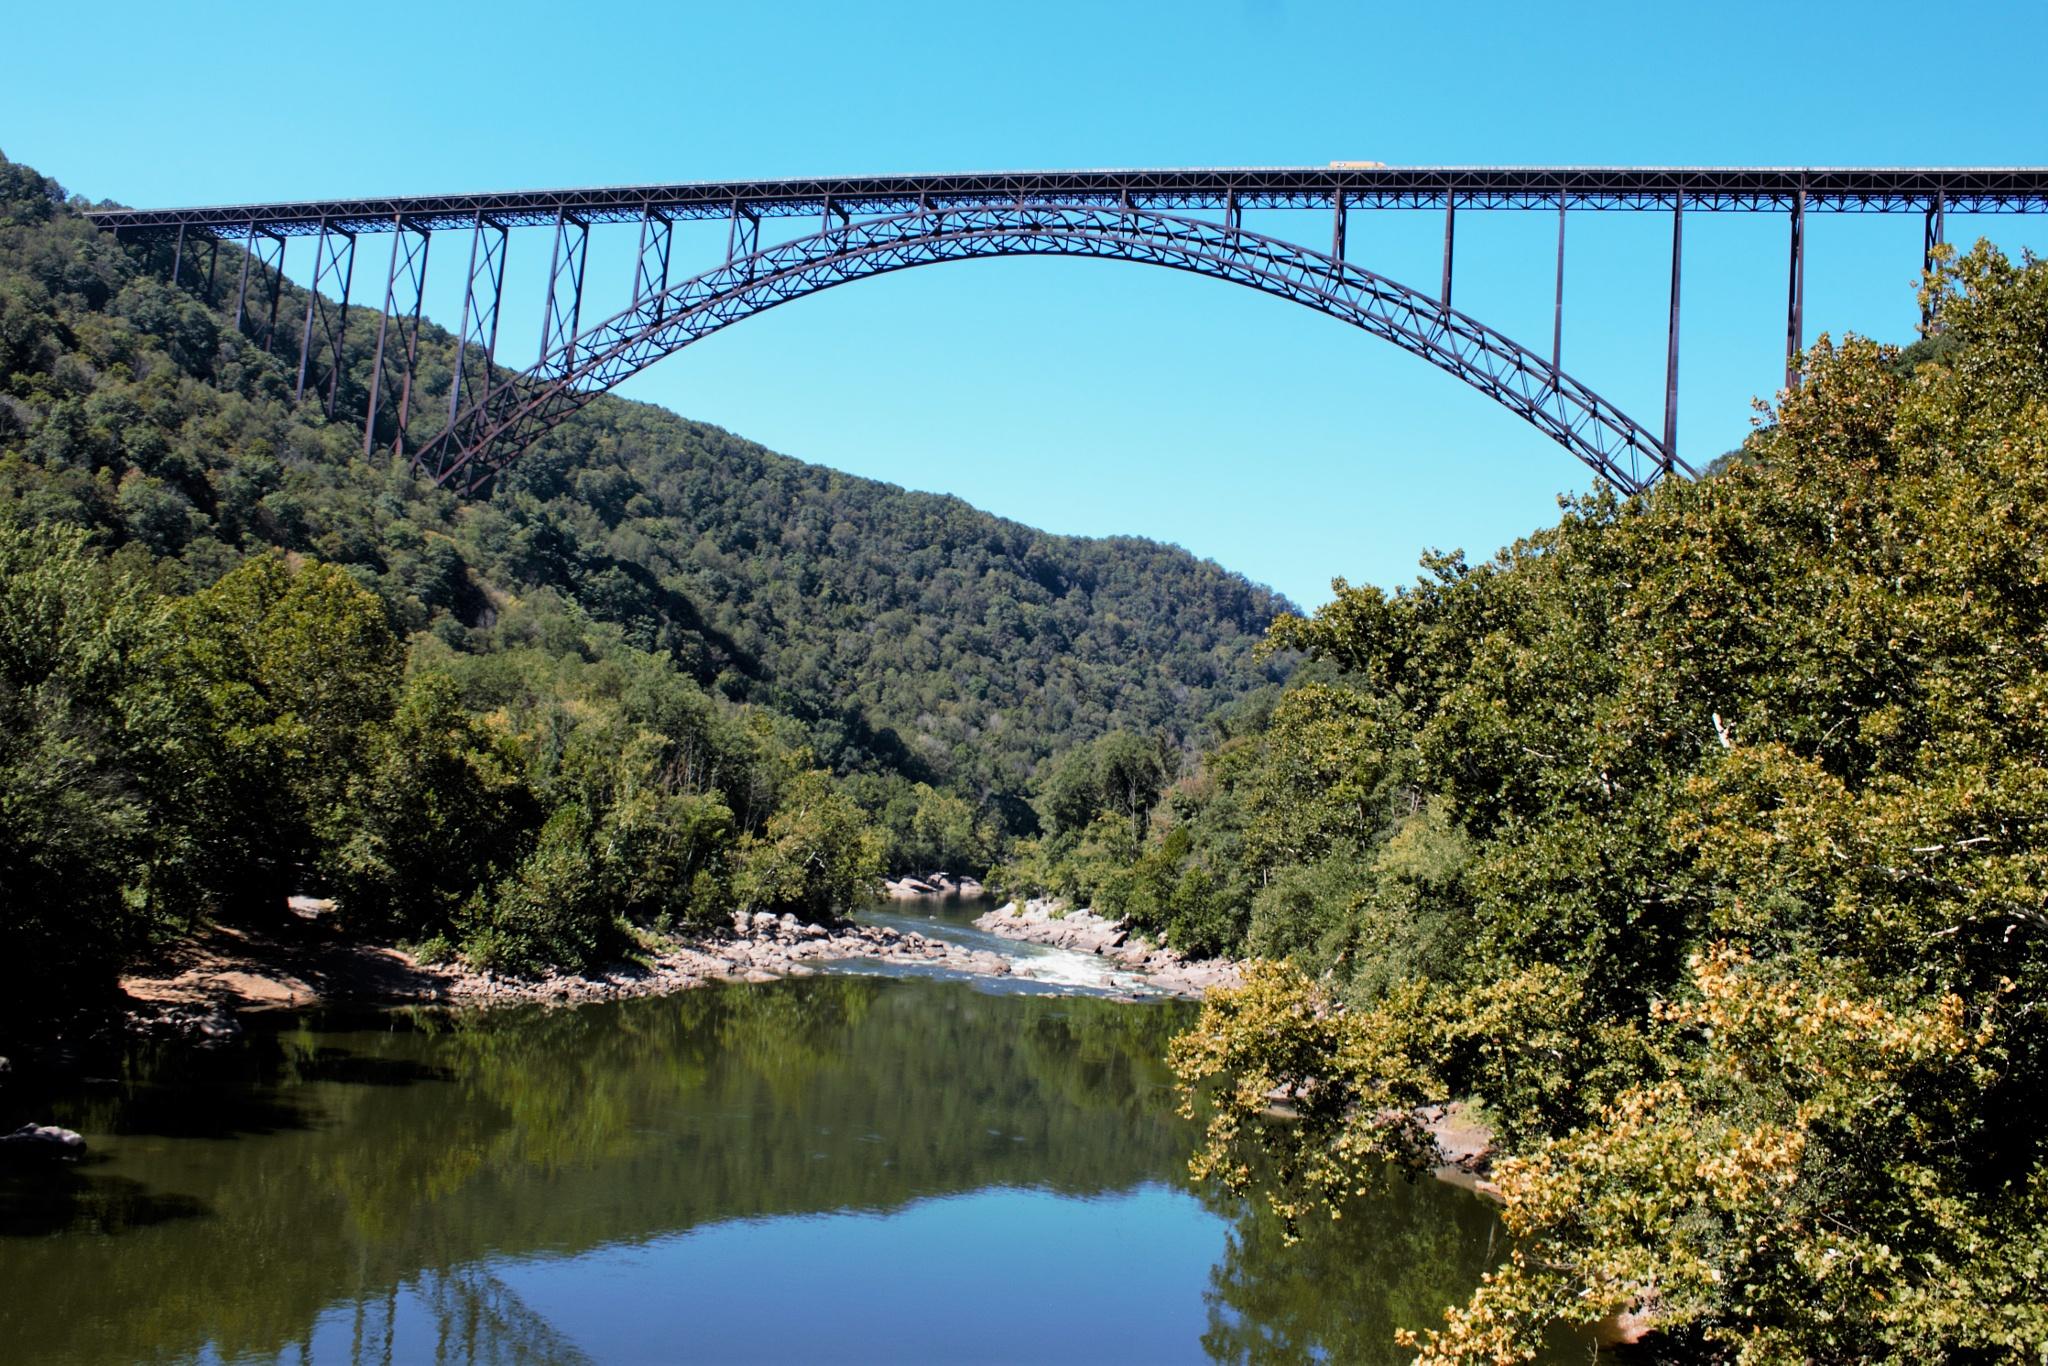 New River Gorge Bridge, West Virginia by Lisa Marshall Moore